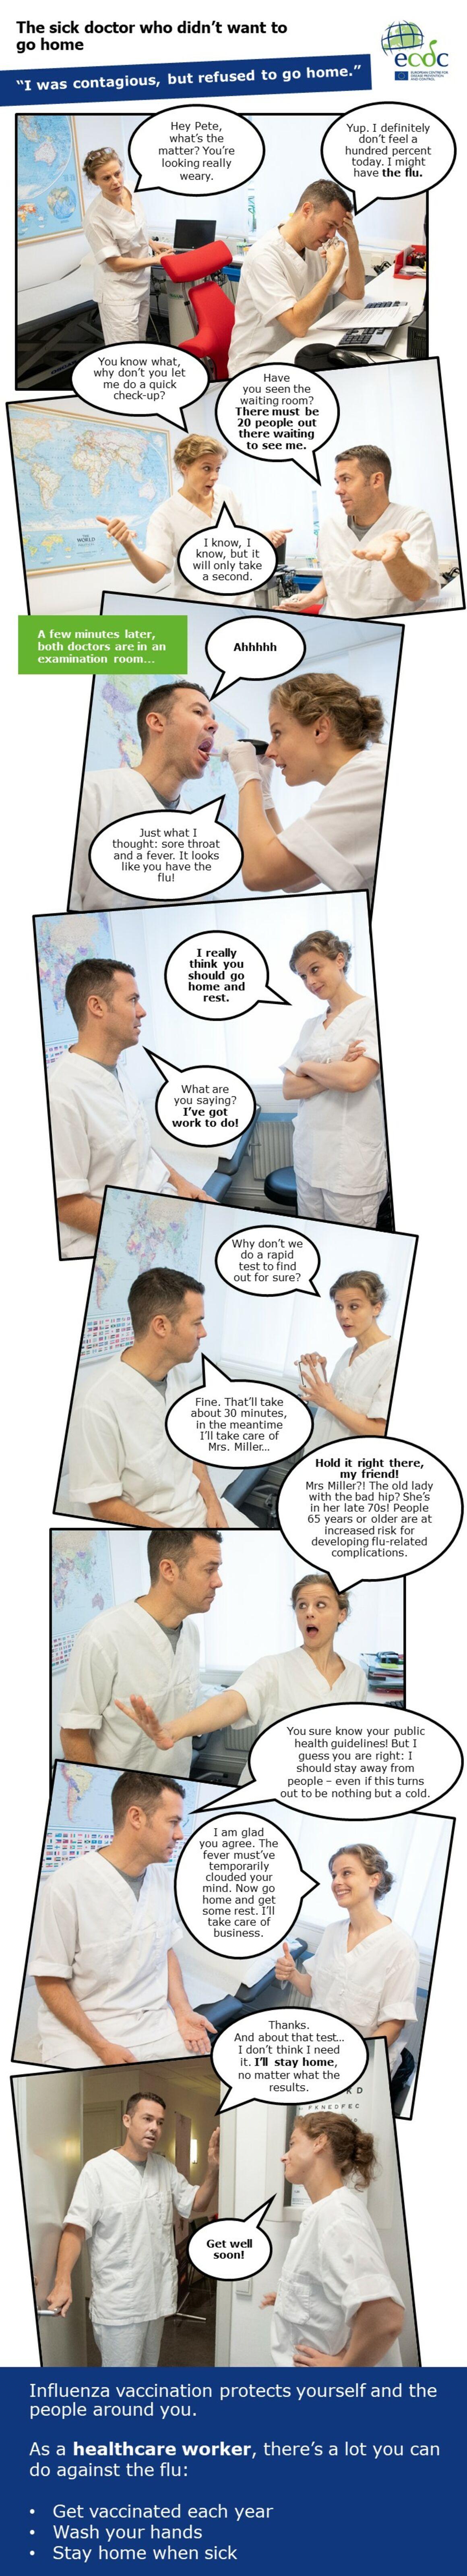 Photo comic web banner seasonal influenza vaccination - Sick doctor